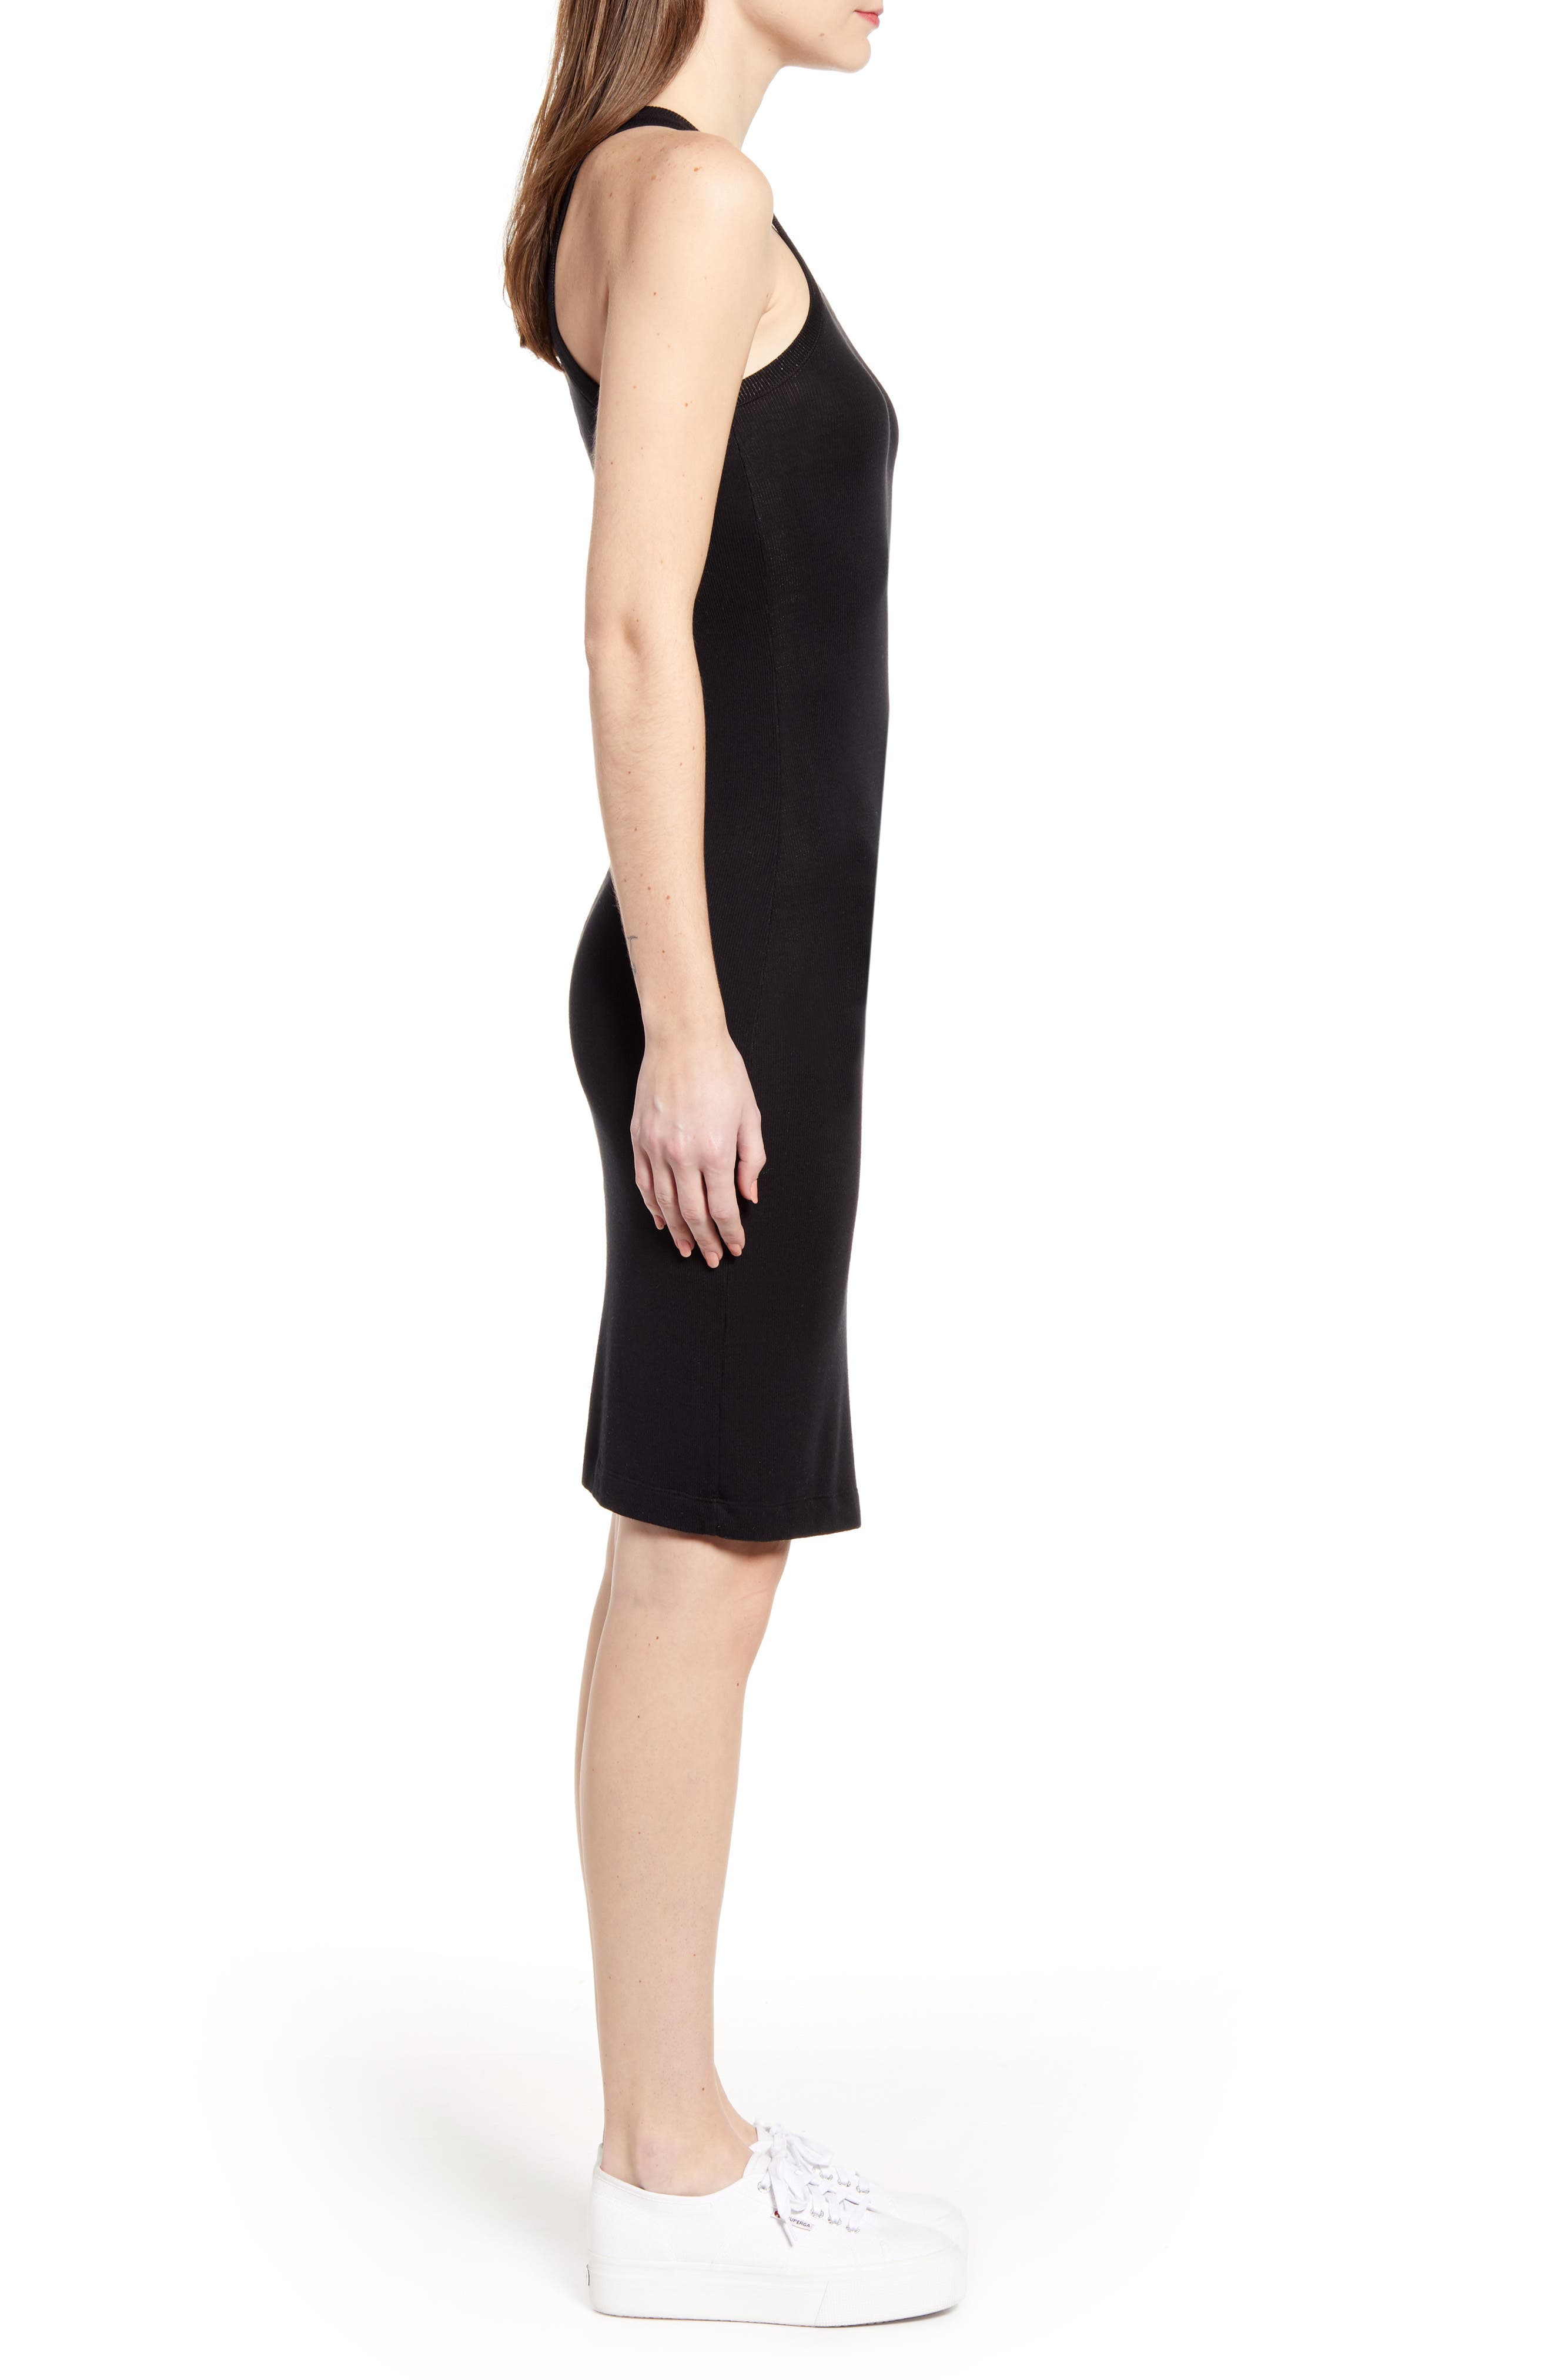 SPLENDID, Racerback Knit Dress, Alternate thumbnail 4, color, BLACK